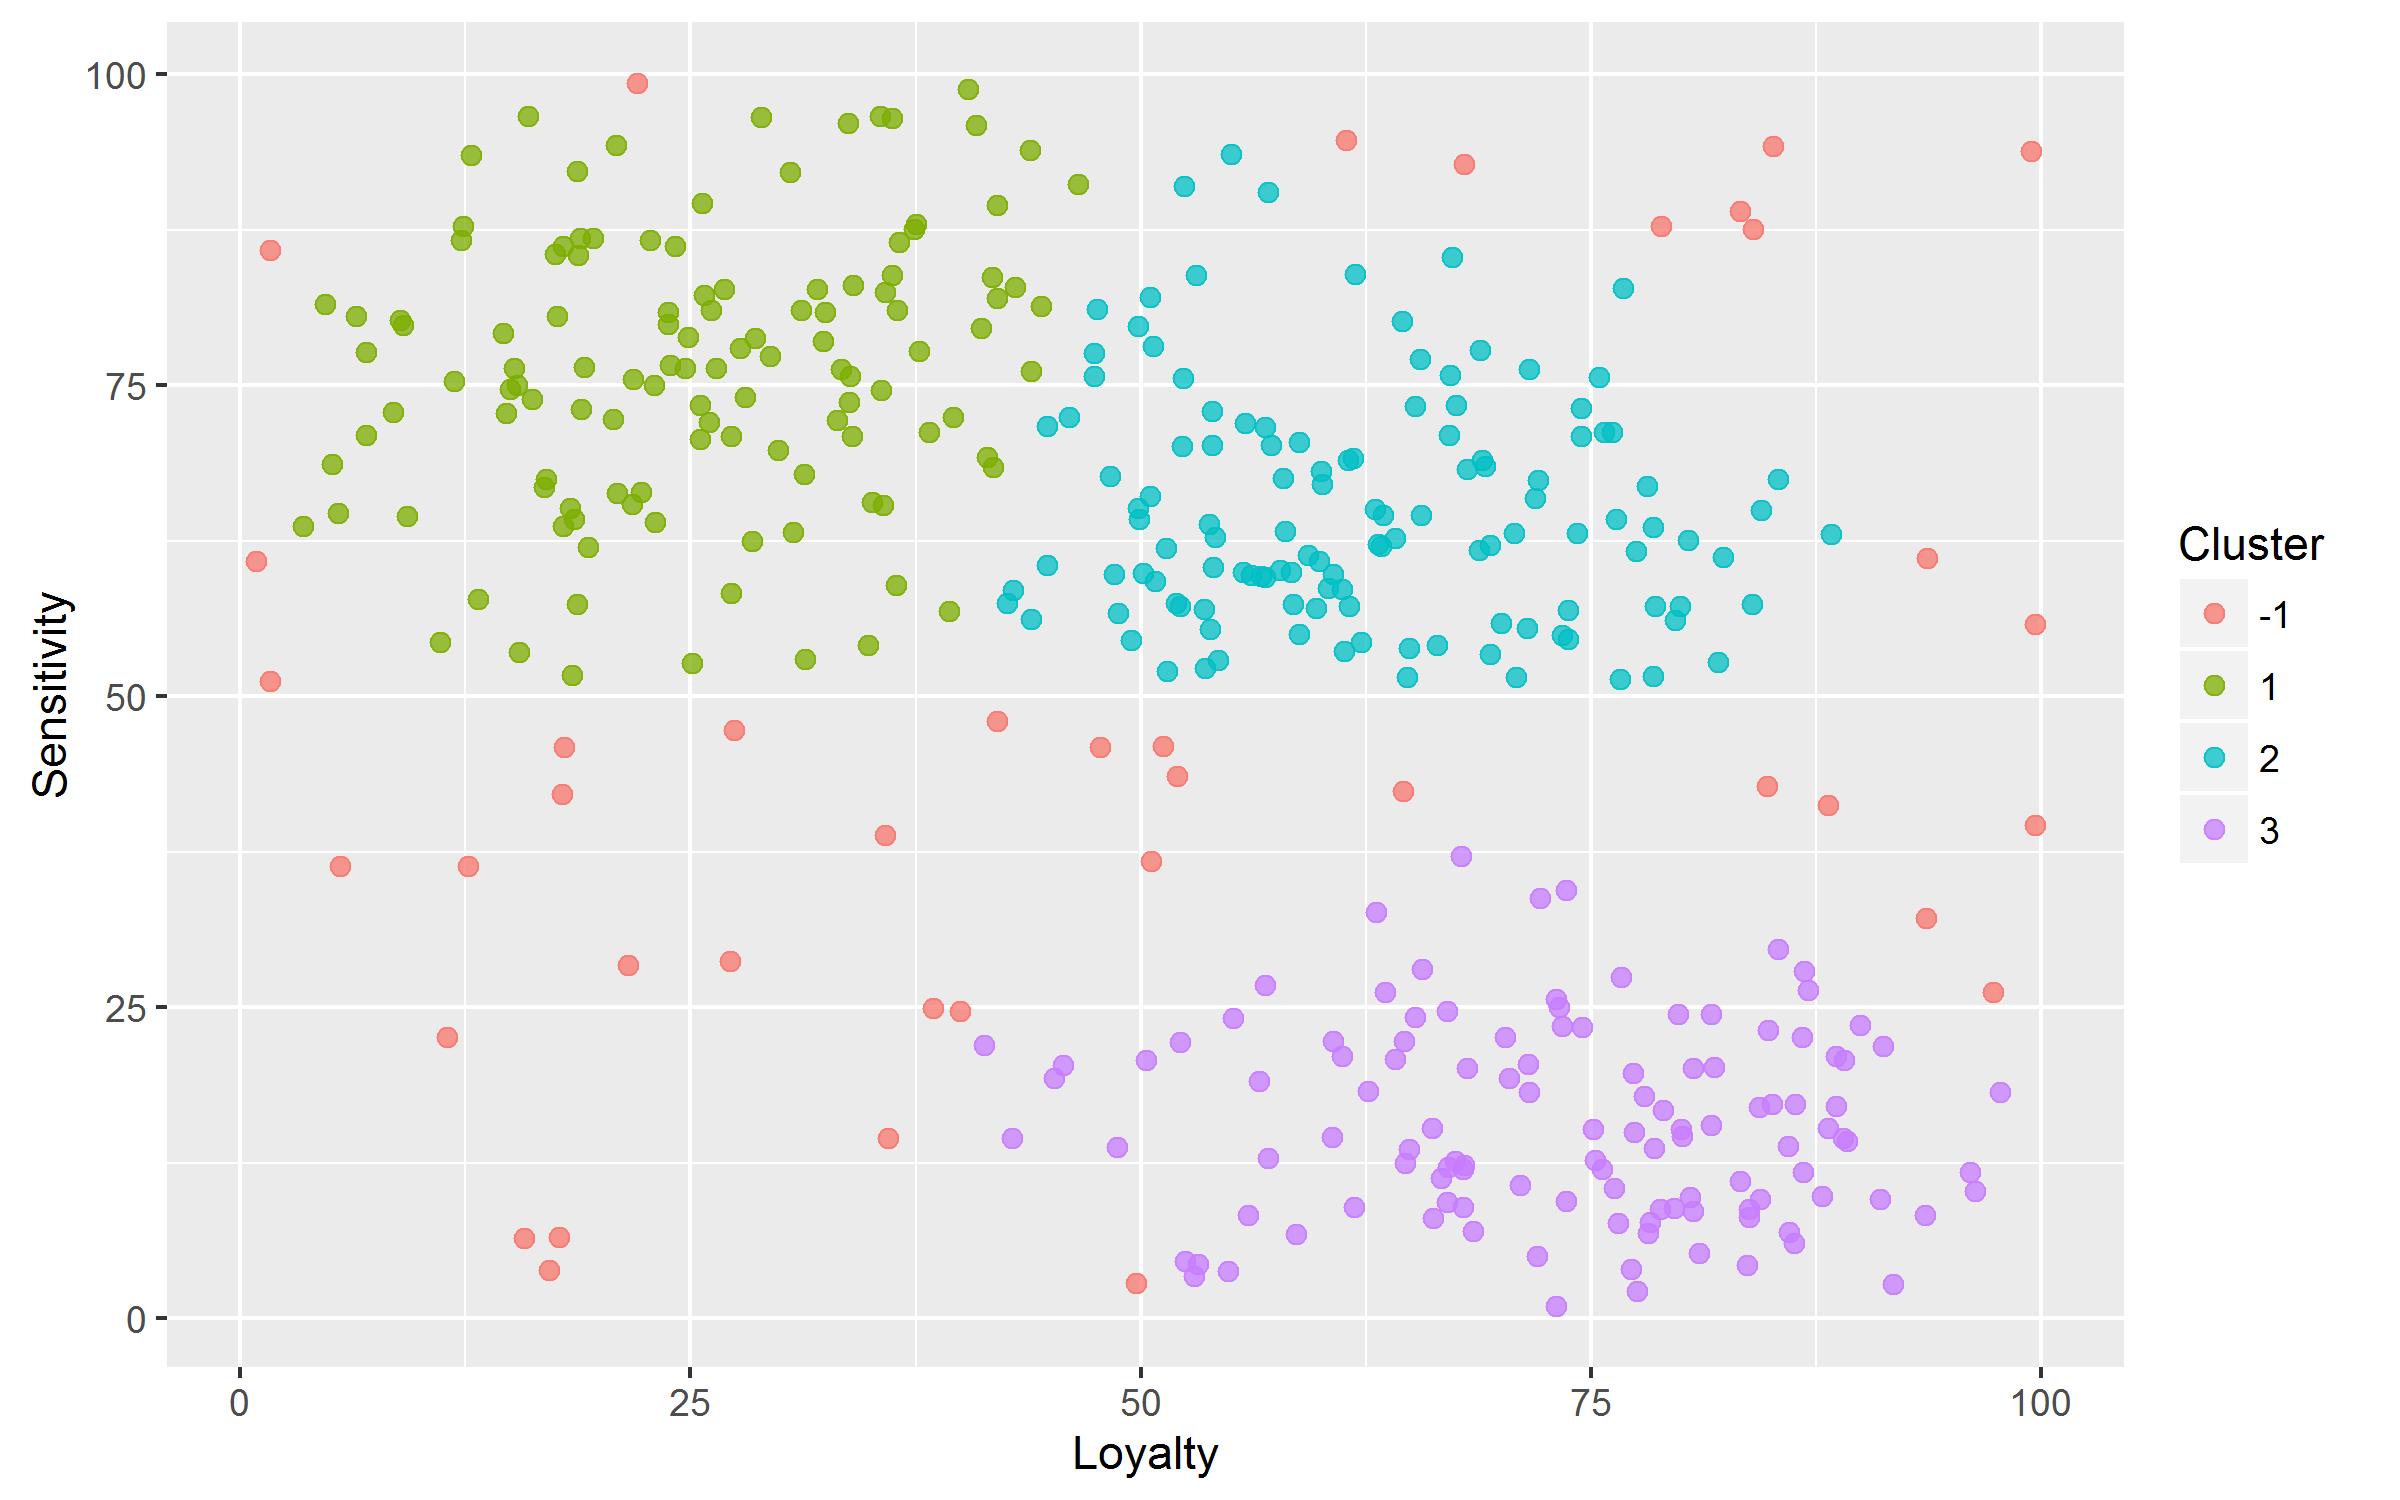 Figure 7 : K-Means clustering